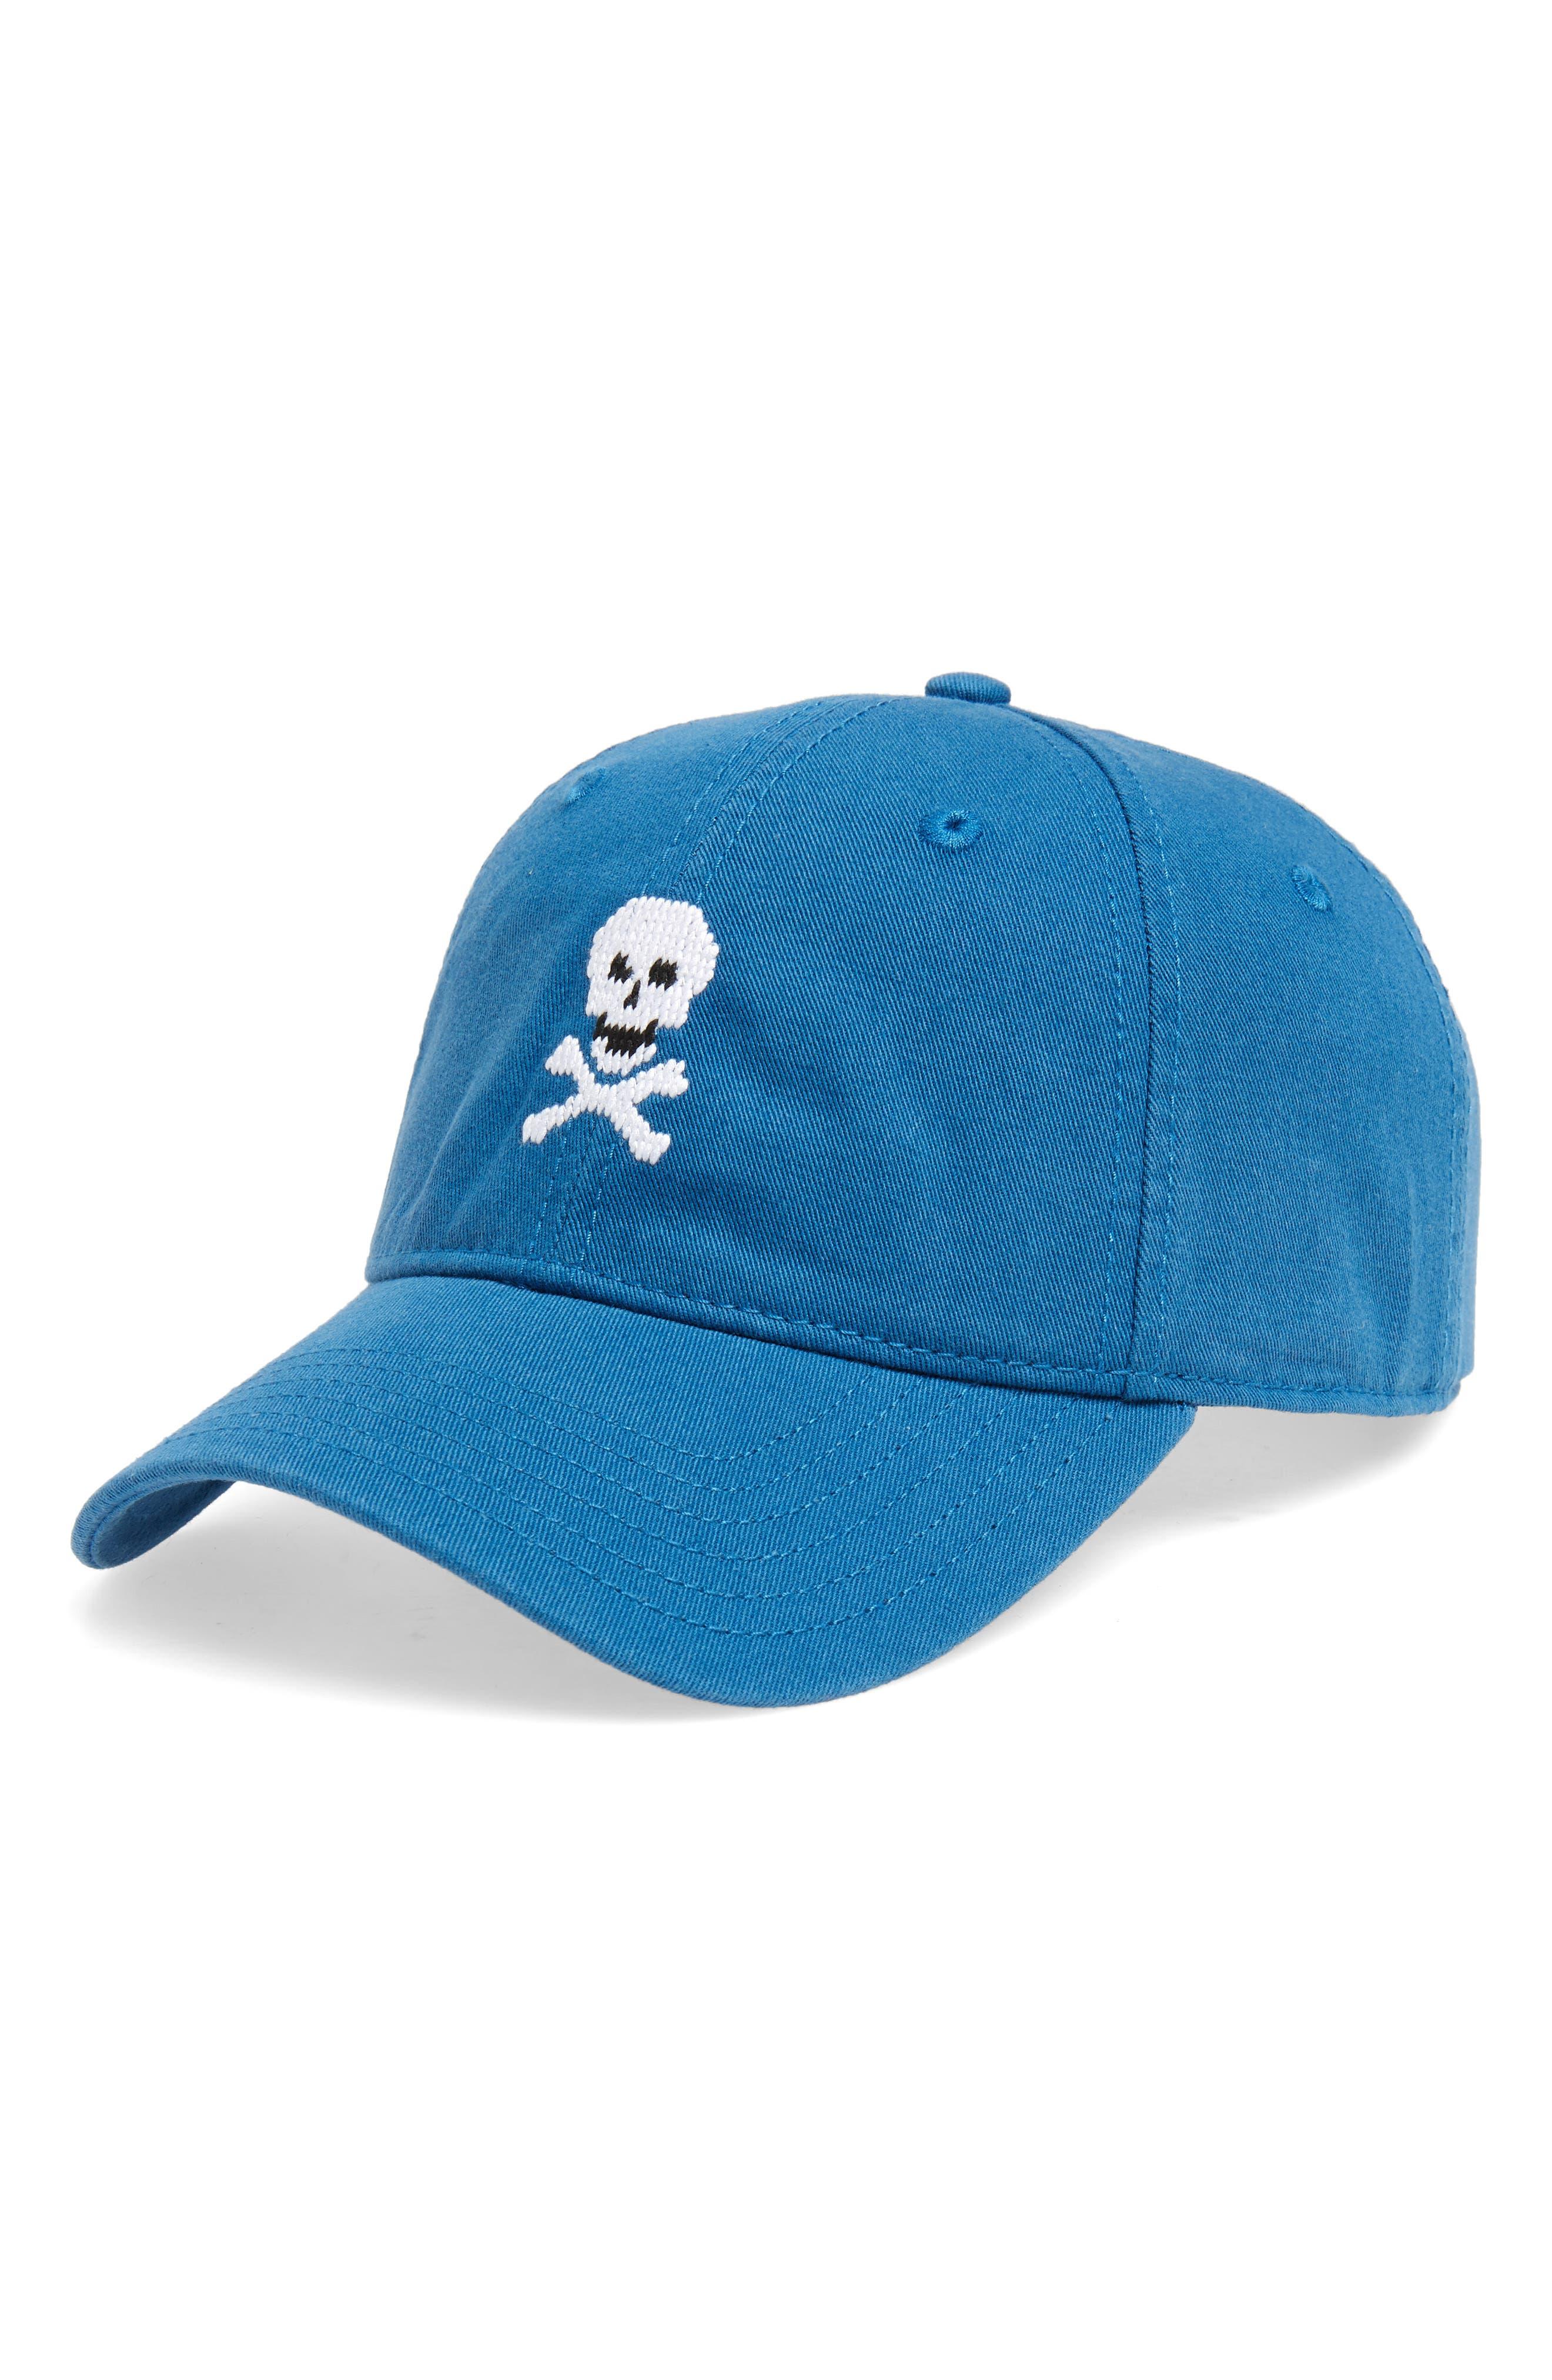 Skull & Bones Baseball Cap,                         Main,                         color, 400